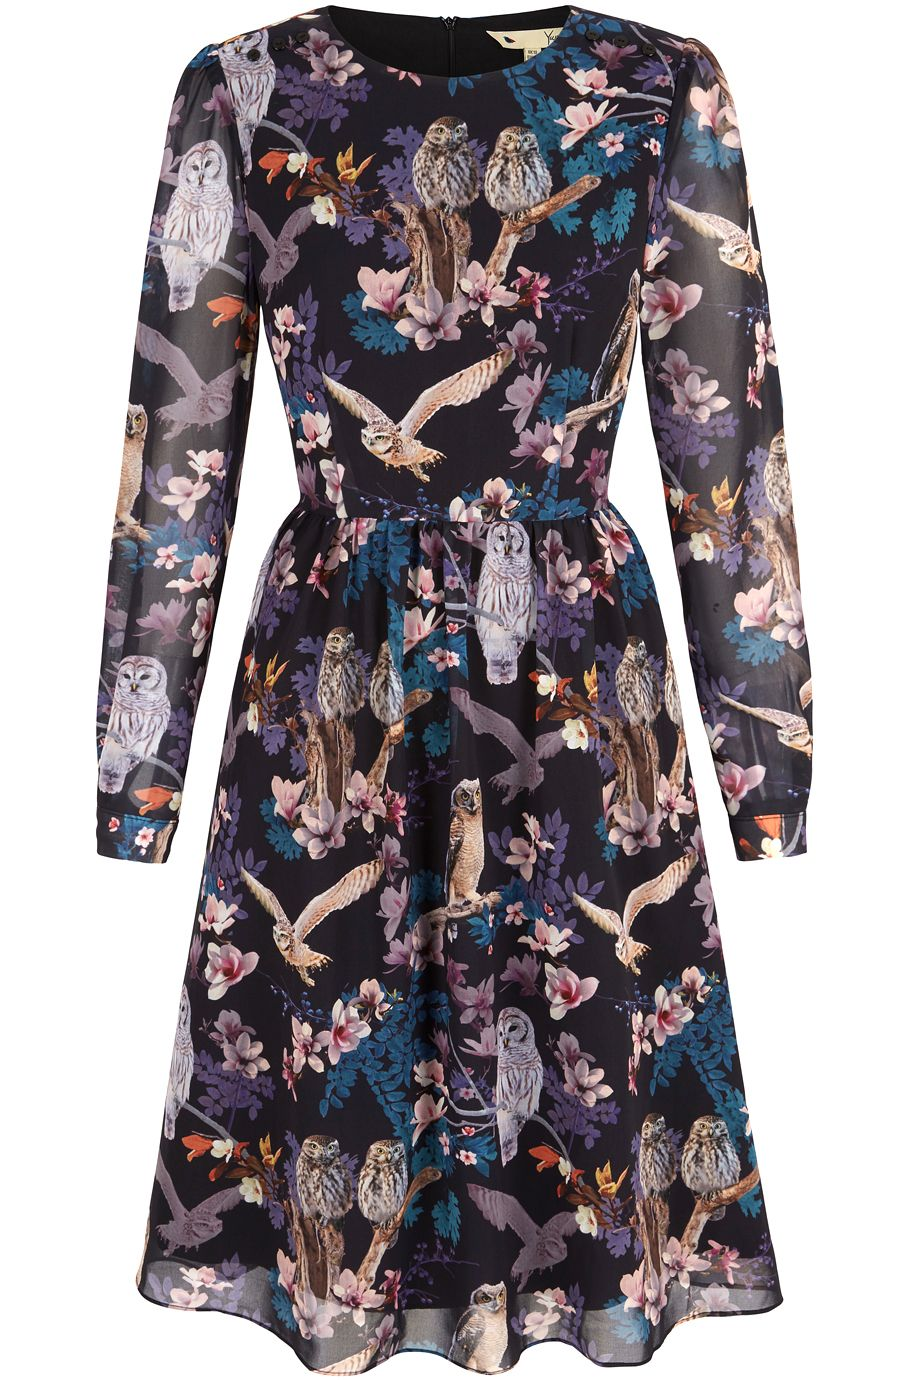 Owl and Flower print dress, Yumi London